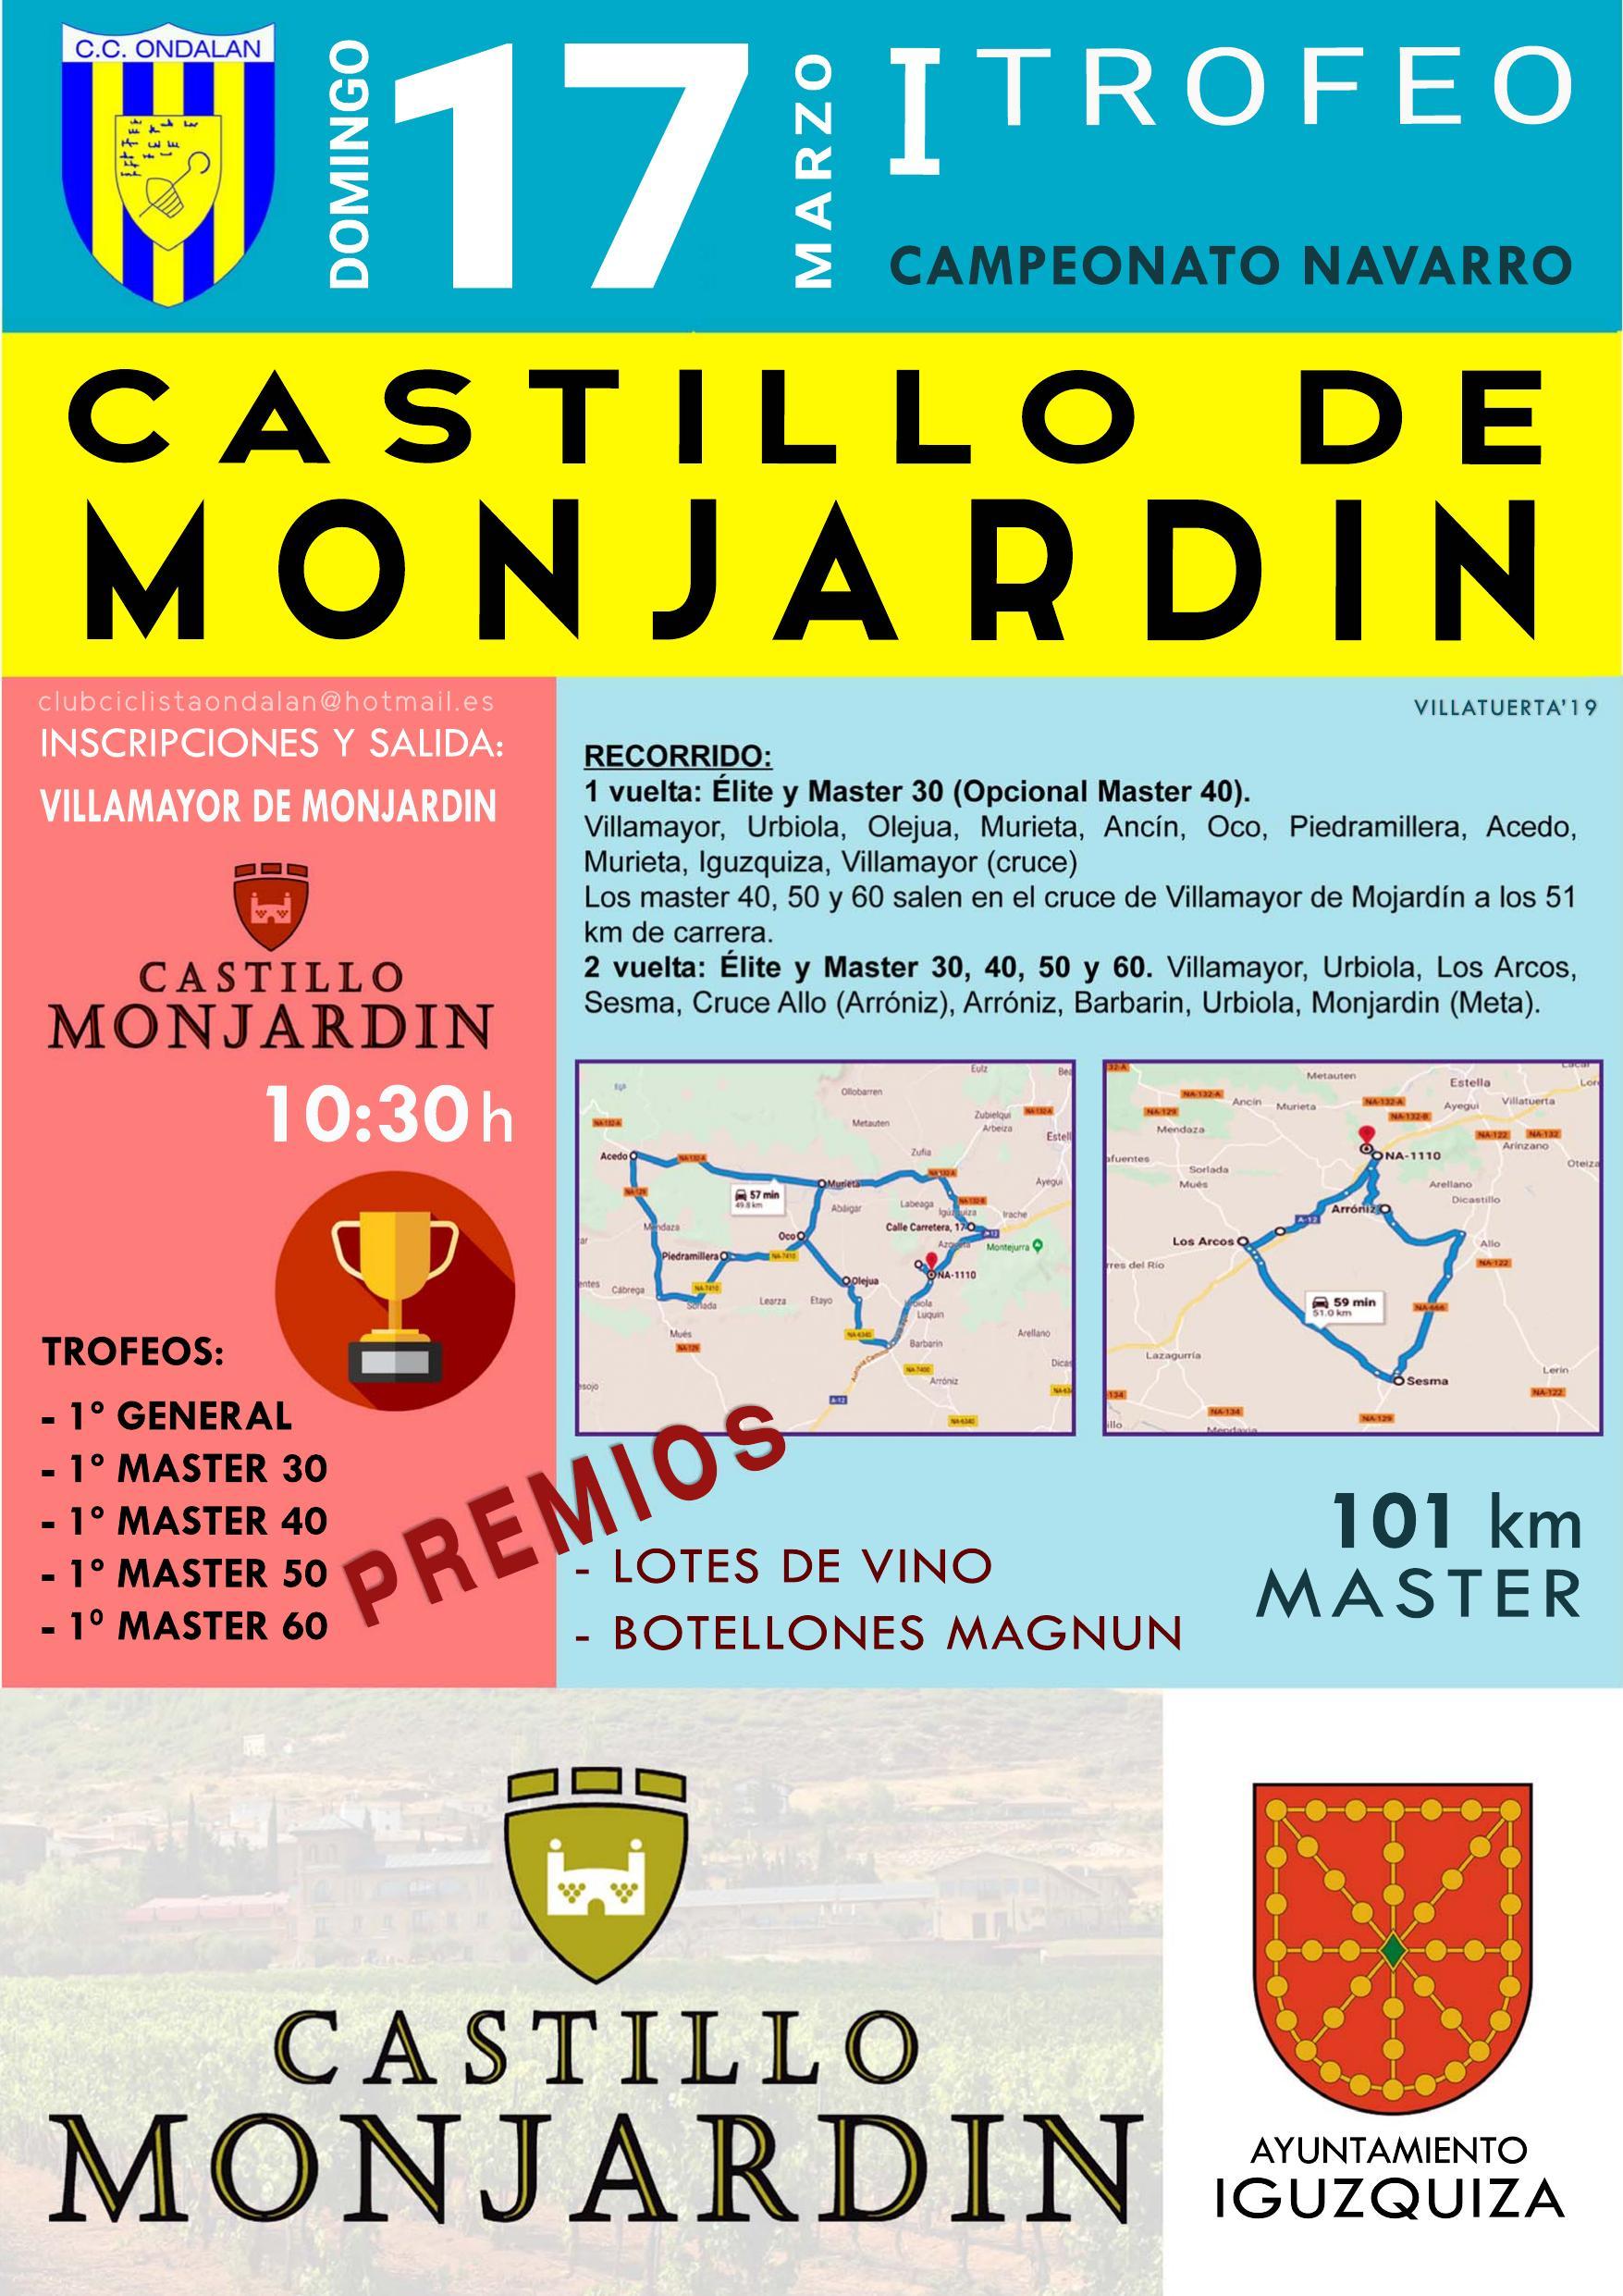 Resultado de imagem para I Trofeo Bodega Castillo de Monjardin. Campeonato Navarro Master